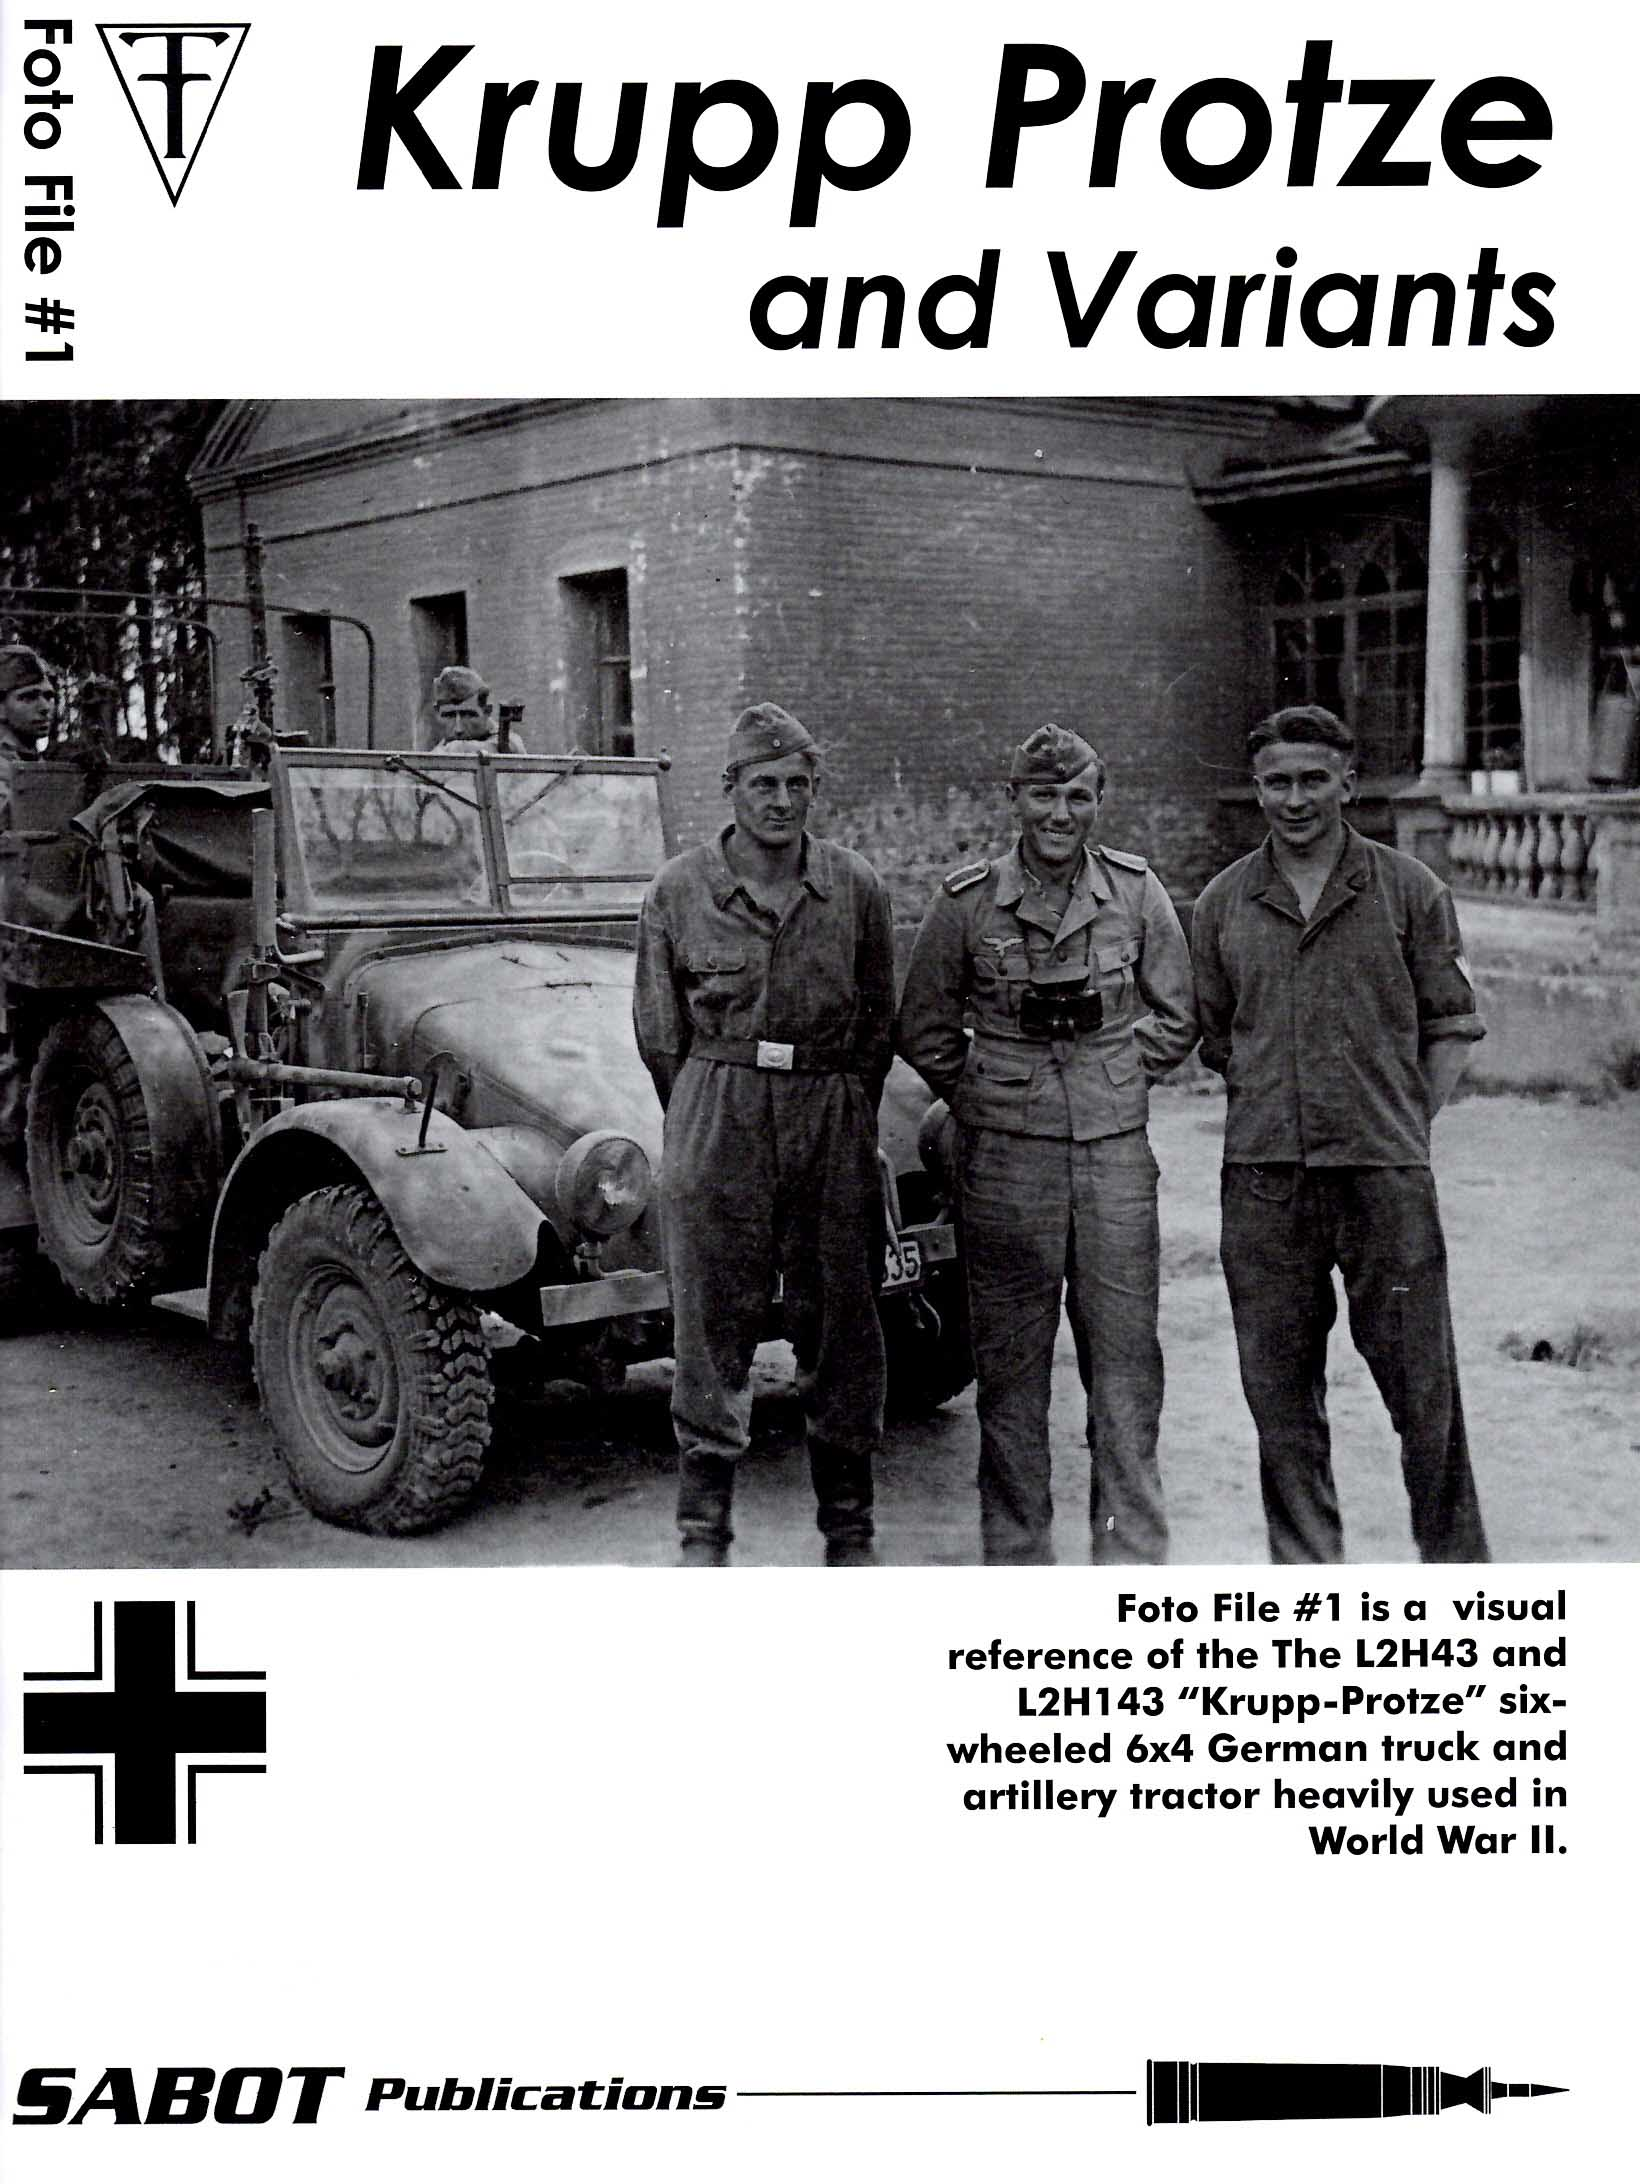 Krupp Protze and variants